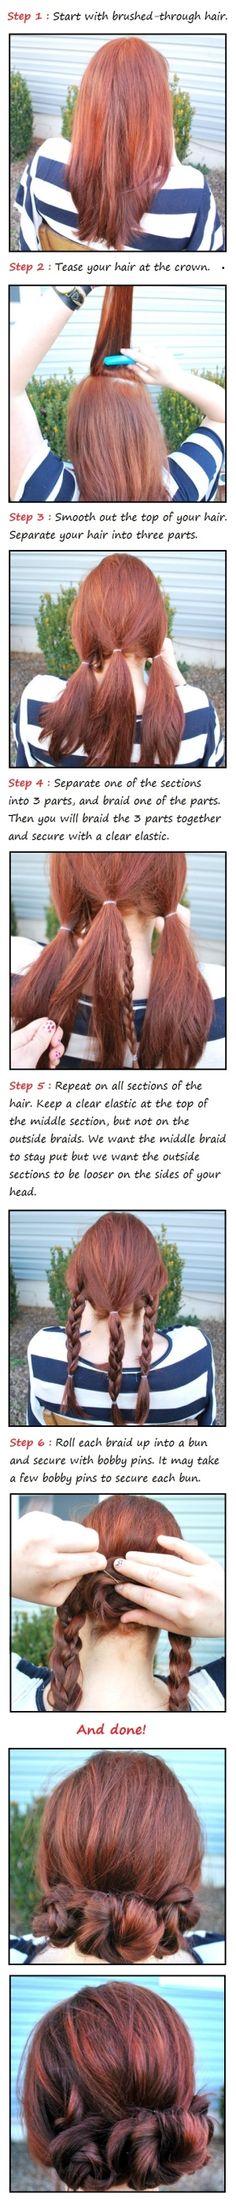 The three Braided Buns Updo Hair Tutorial | Beauty Tutorials by imad karrari